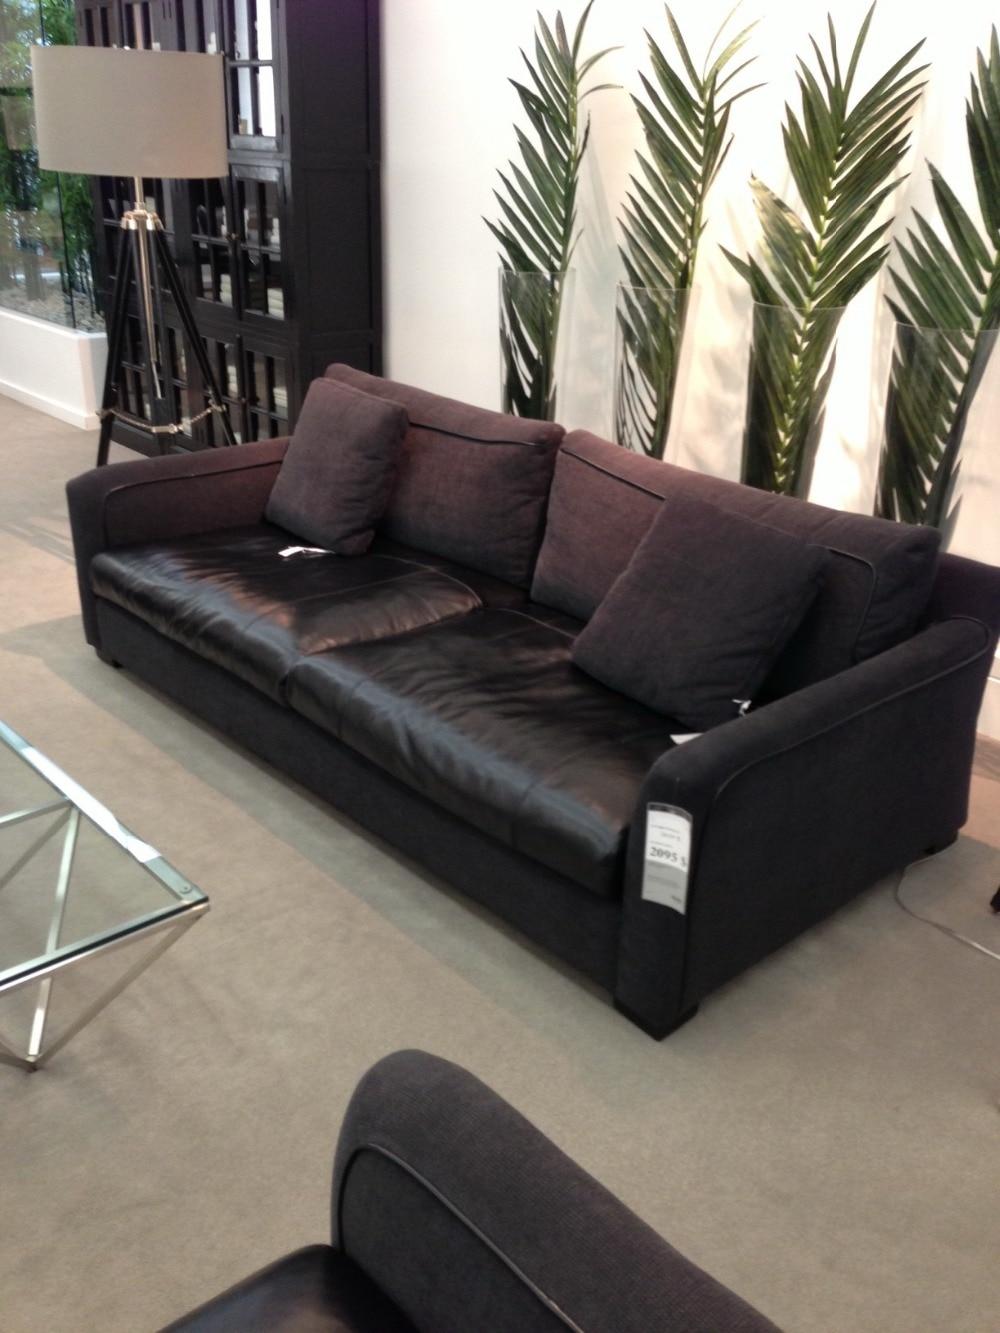 online get cheap sectional sofa set aliexpress com alibaba group modern living room sofa 3 french designer genuine leather sofa sectional sofa set